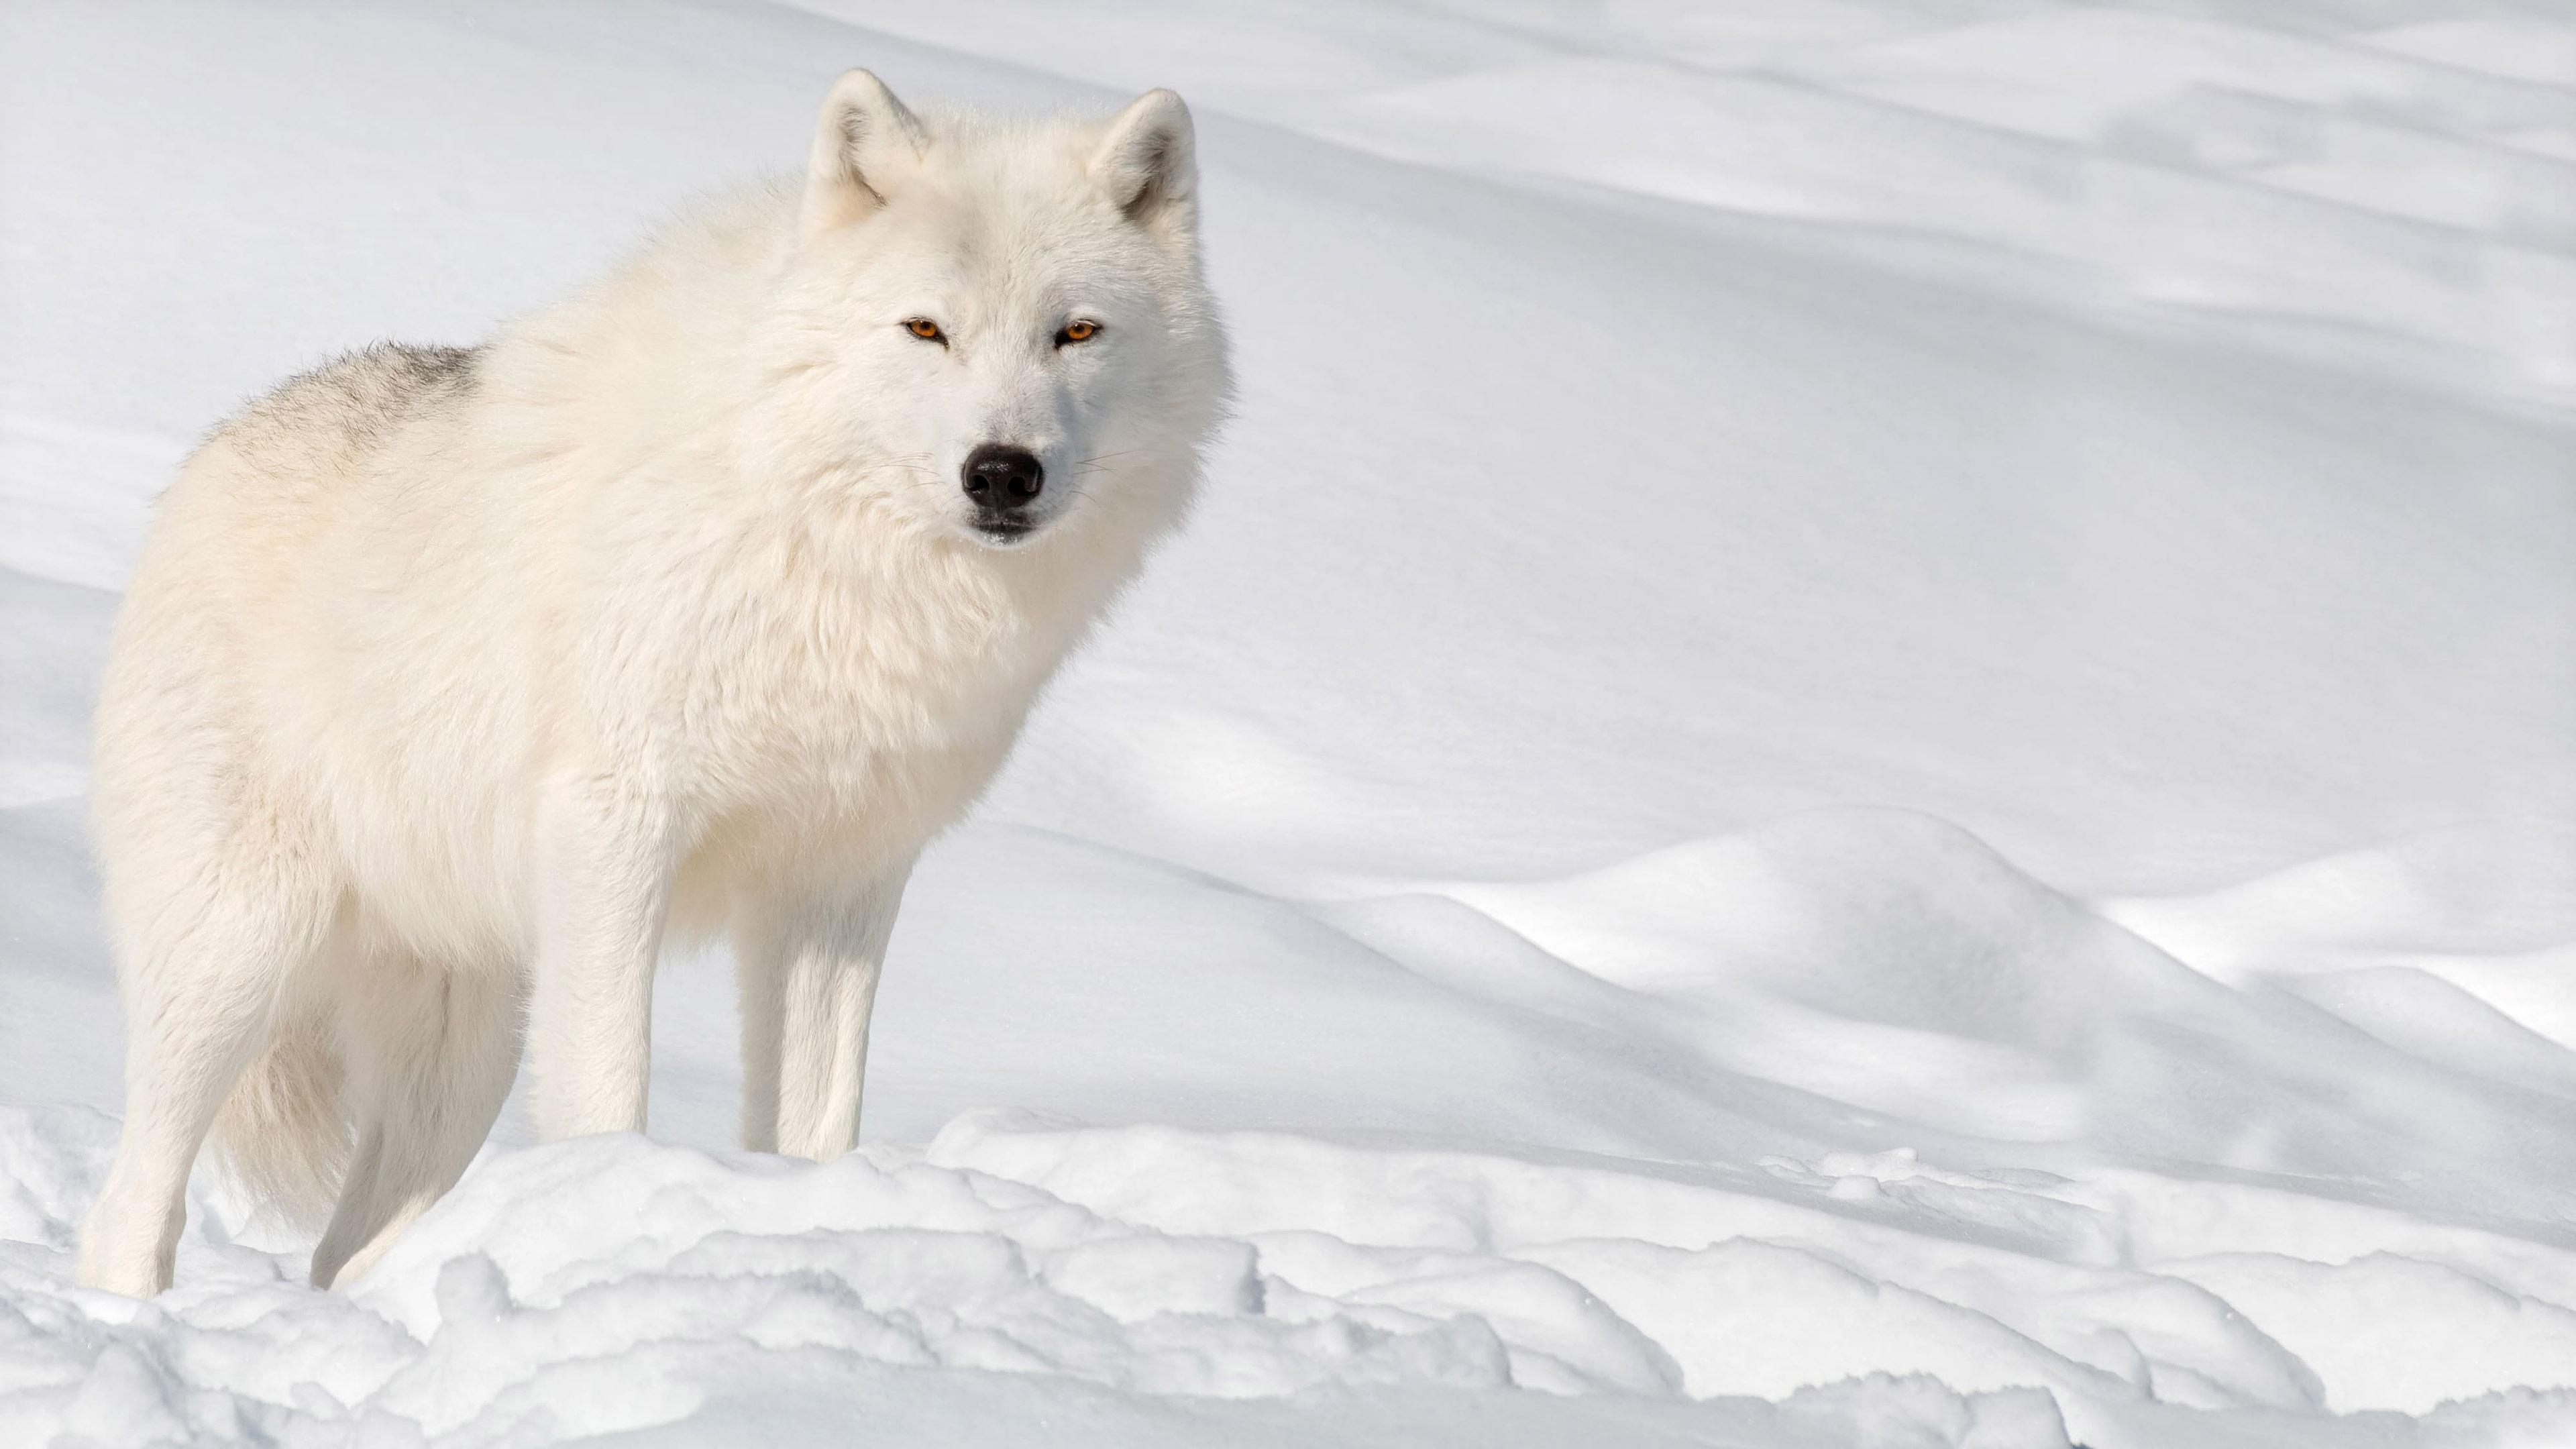 HDoboi.Kiev.ua - Красивый белый волк в снегу, 5k wallpapers for iphone